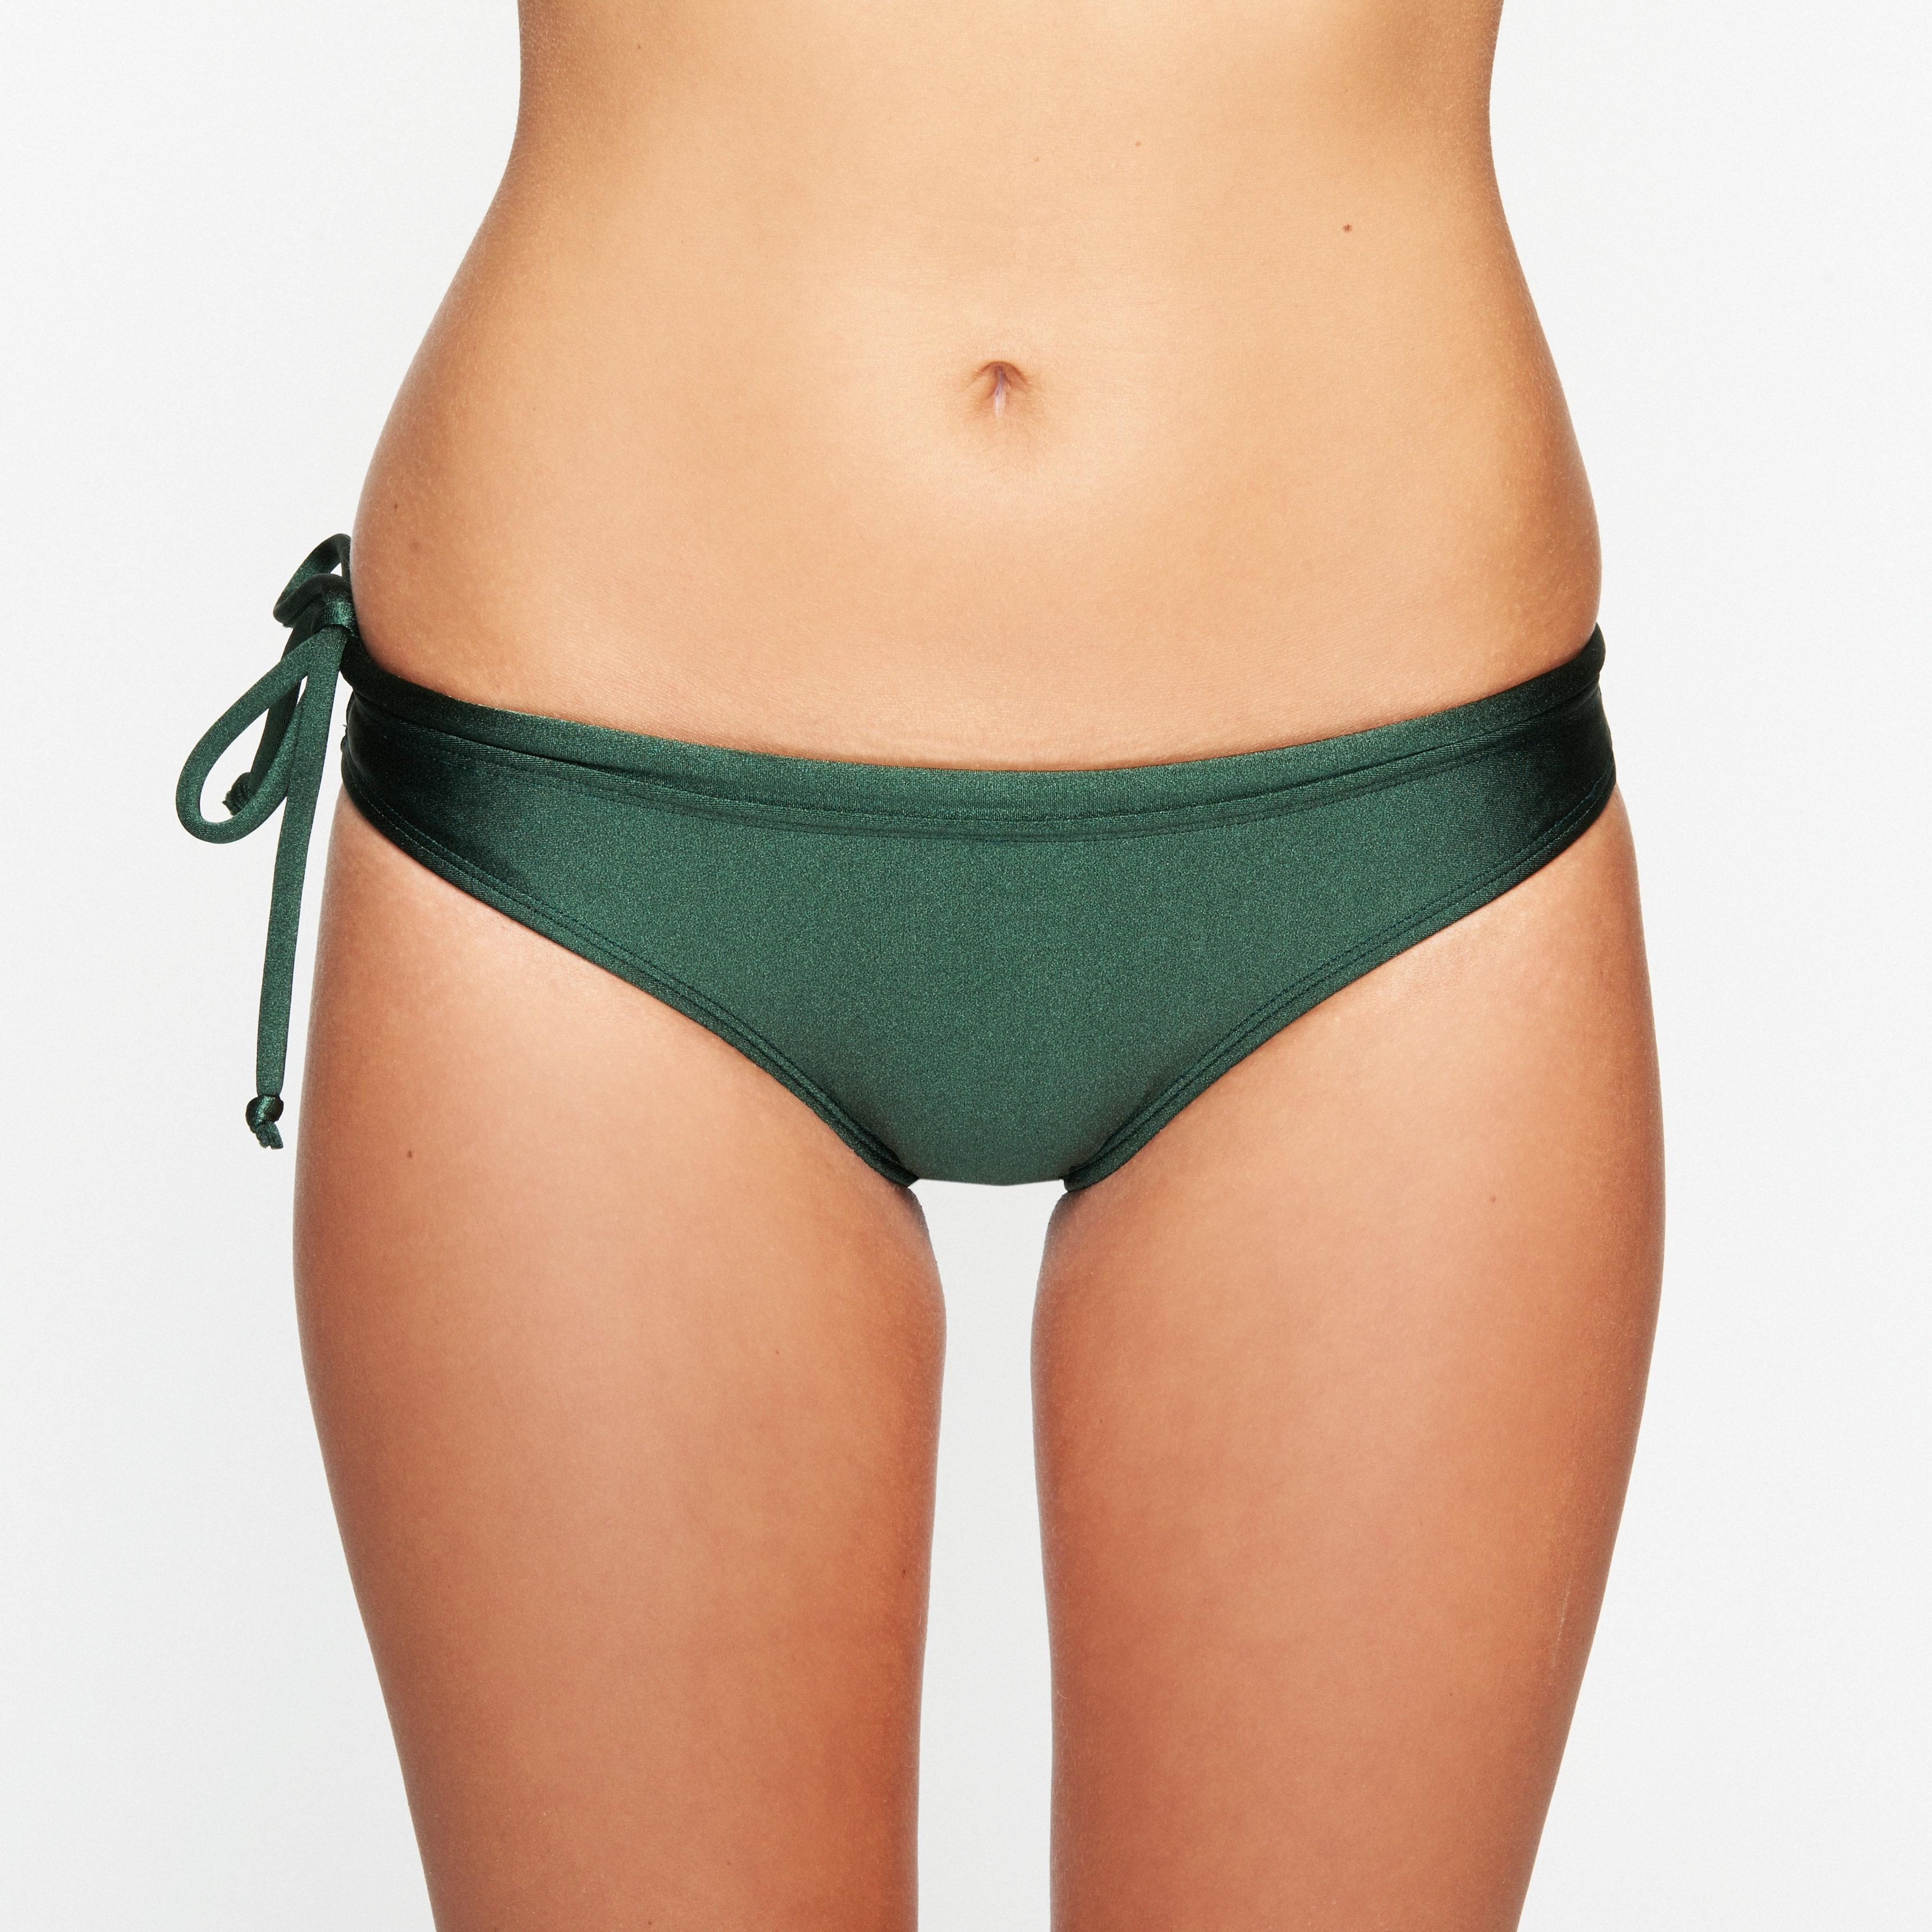 OY Apparel Sumba Bikini Pant Hijau Botol front